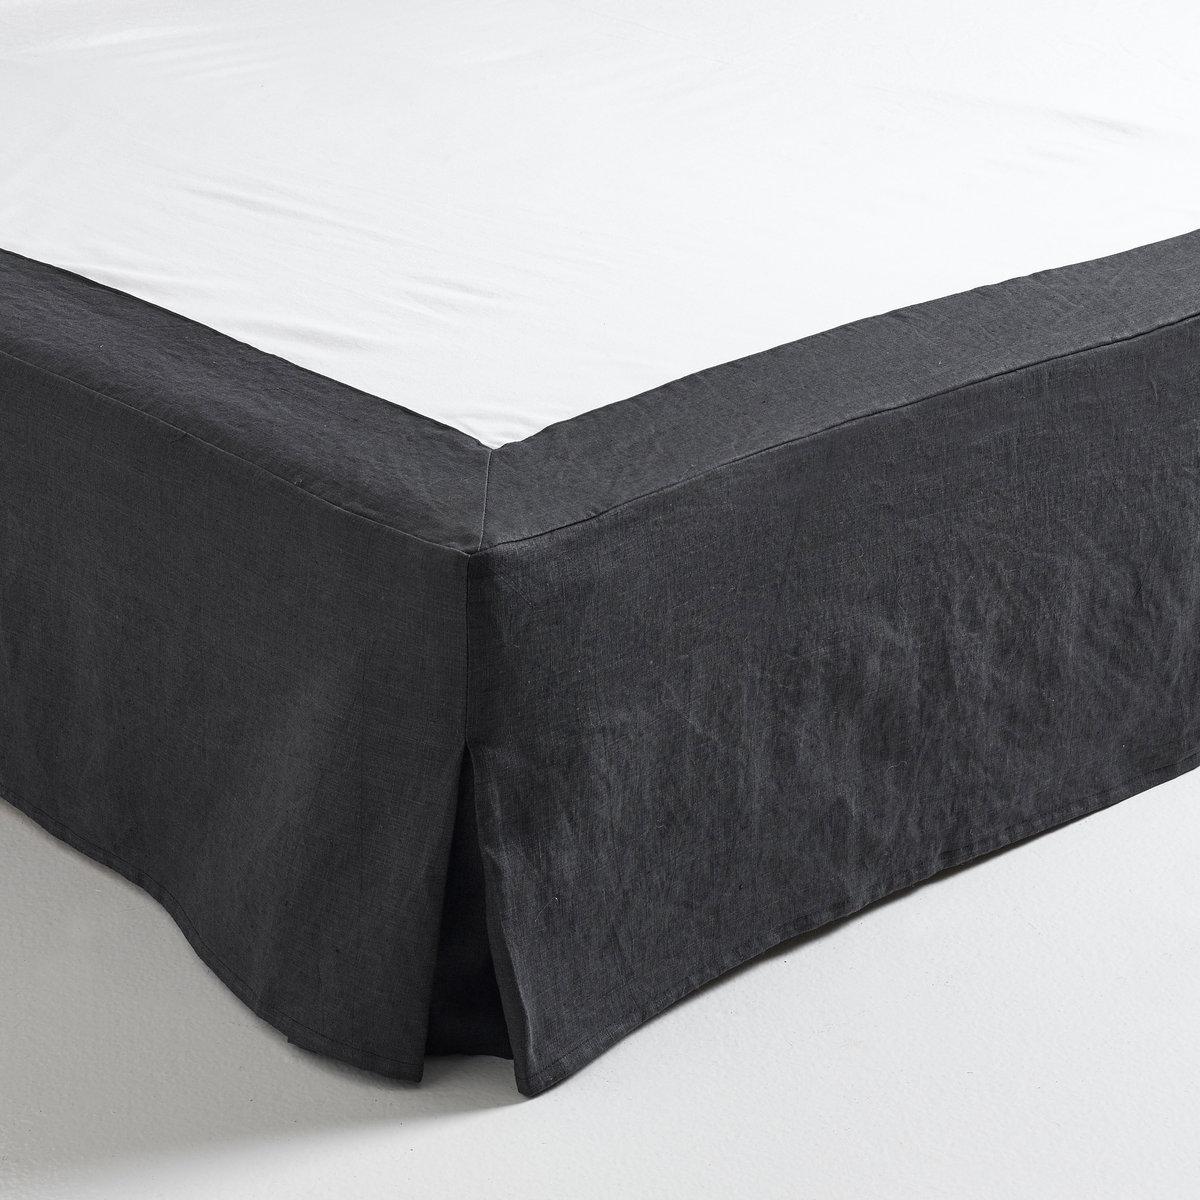 Чехол LaRedoute Для кровати из пенькихлопка Lino 90 x 190 см серый чехол laredoute для кровати 100 льна 160 x 200 см белый